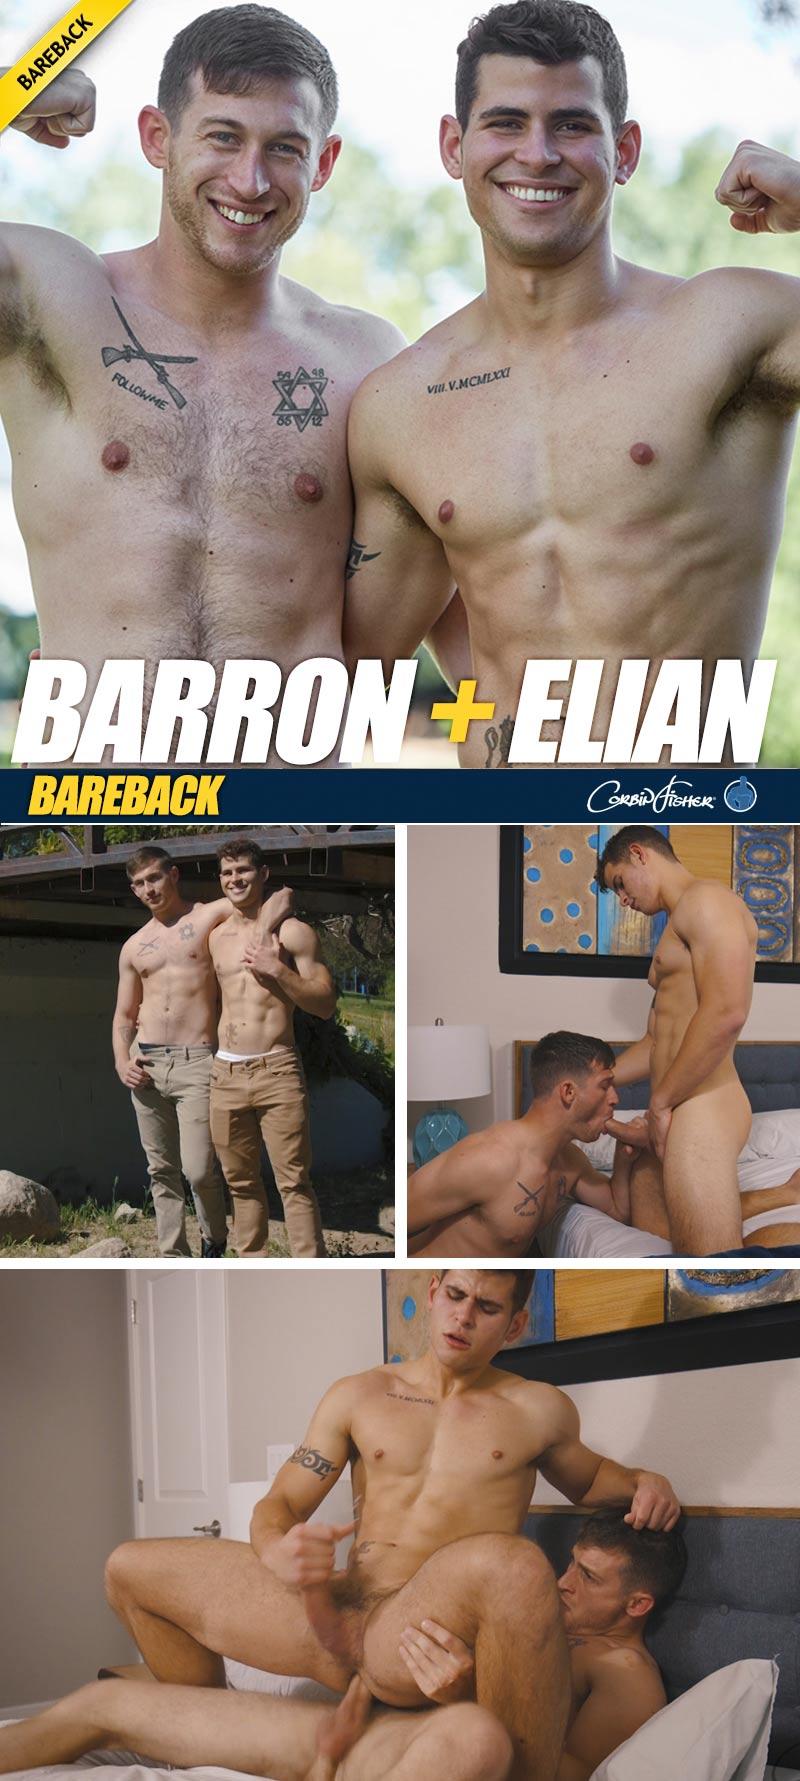 Barron Drills Elian at CorbinFisher